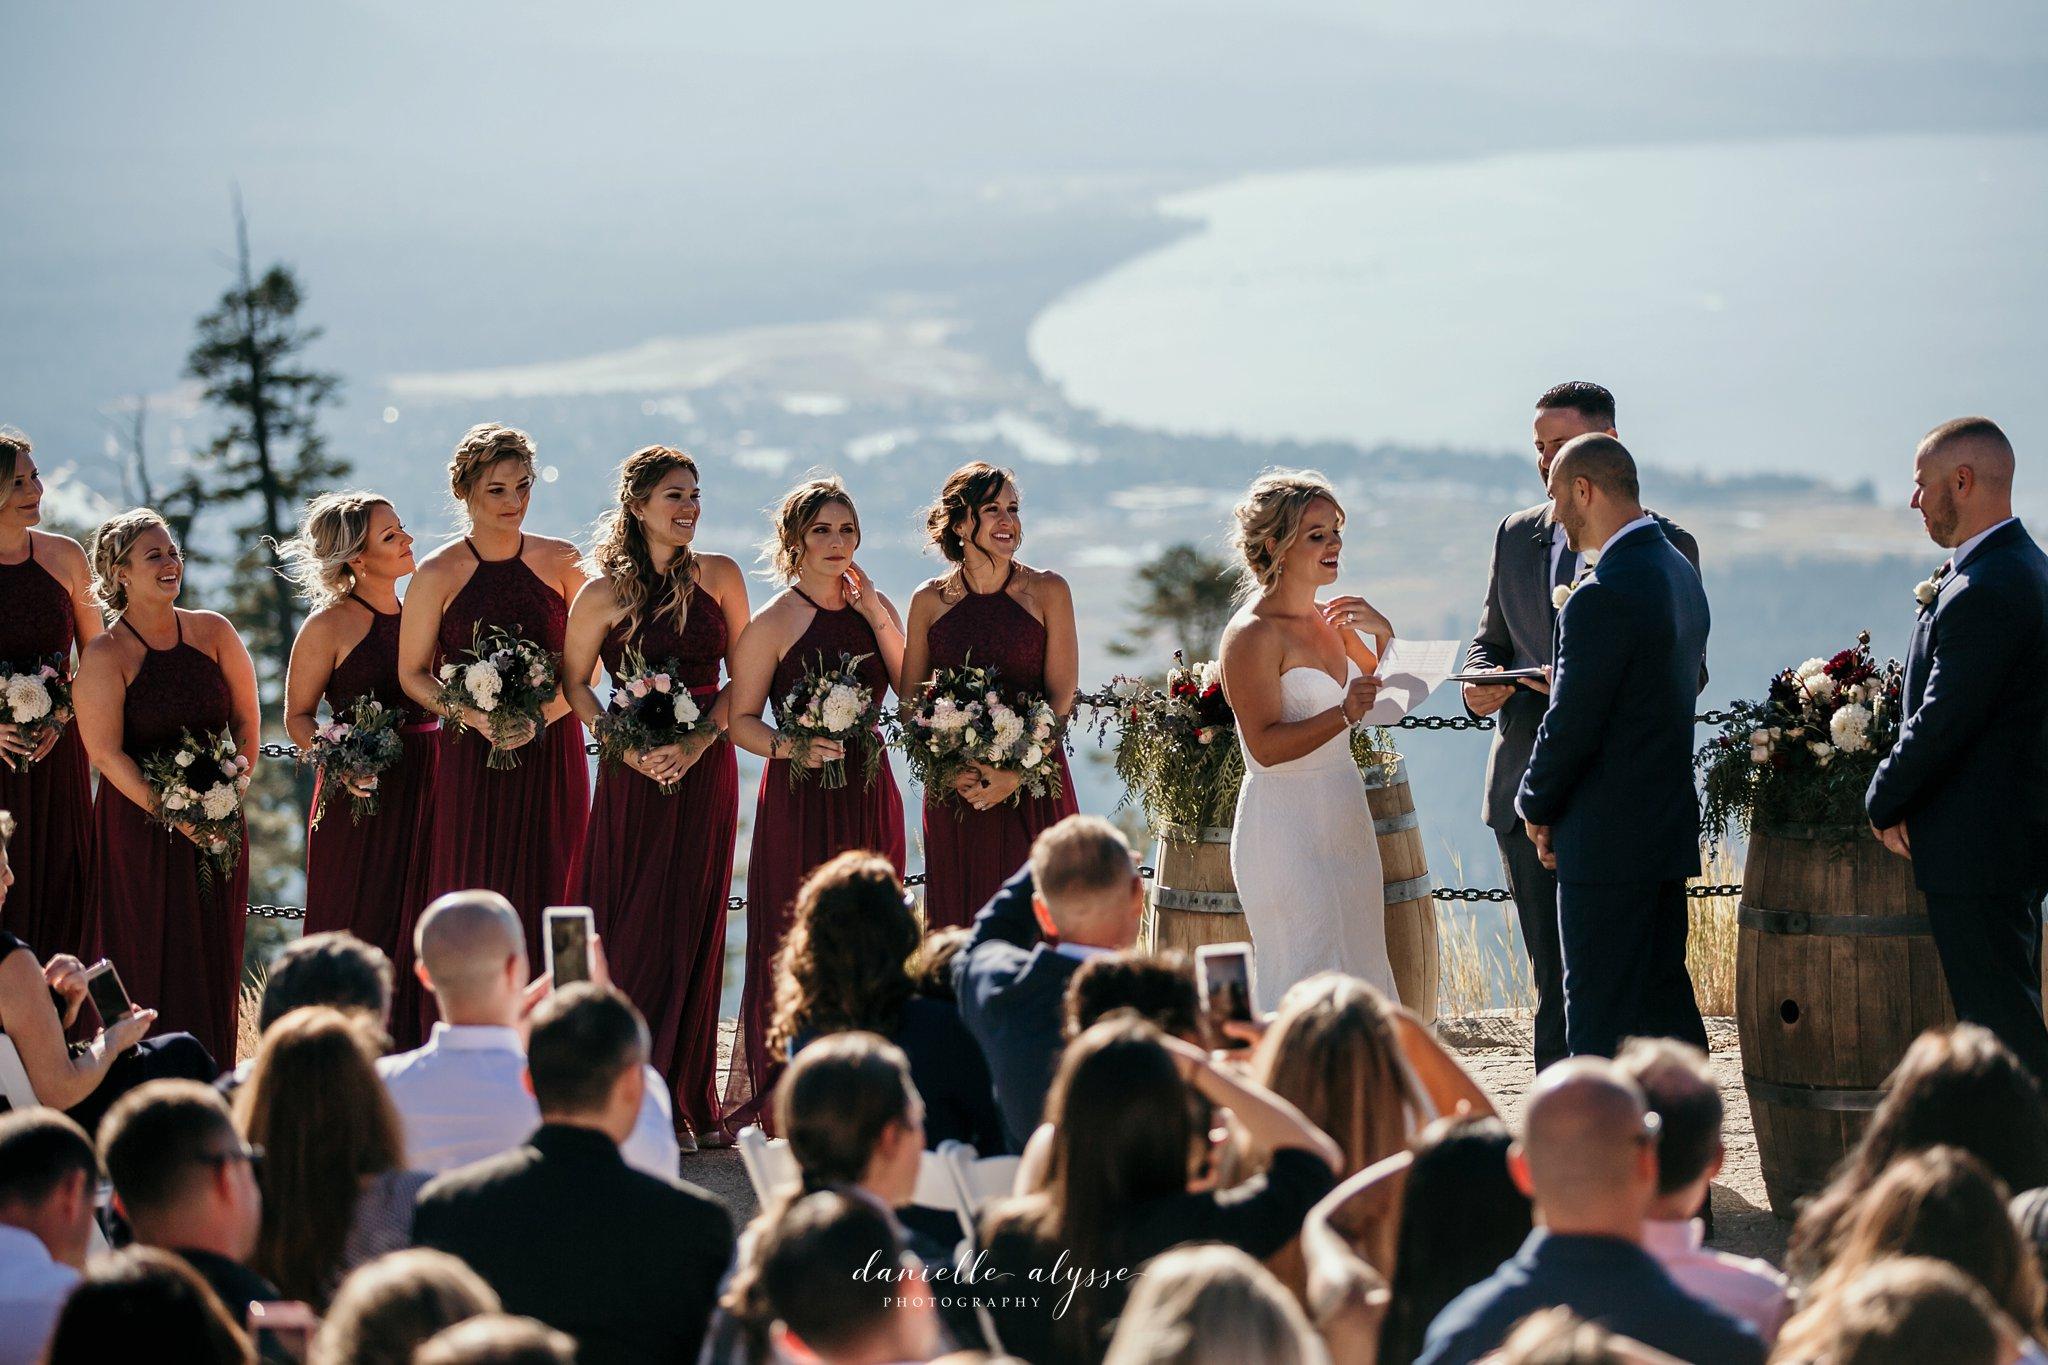 180831_wedding_stephanie_heavenly_south_lake_tahoe_danielle_alysse_photography_destination_blog_682_WEB.jpg